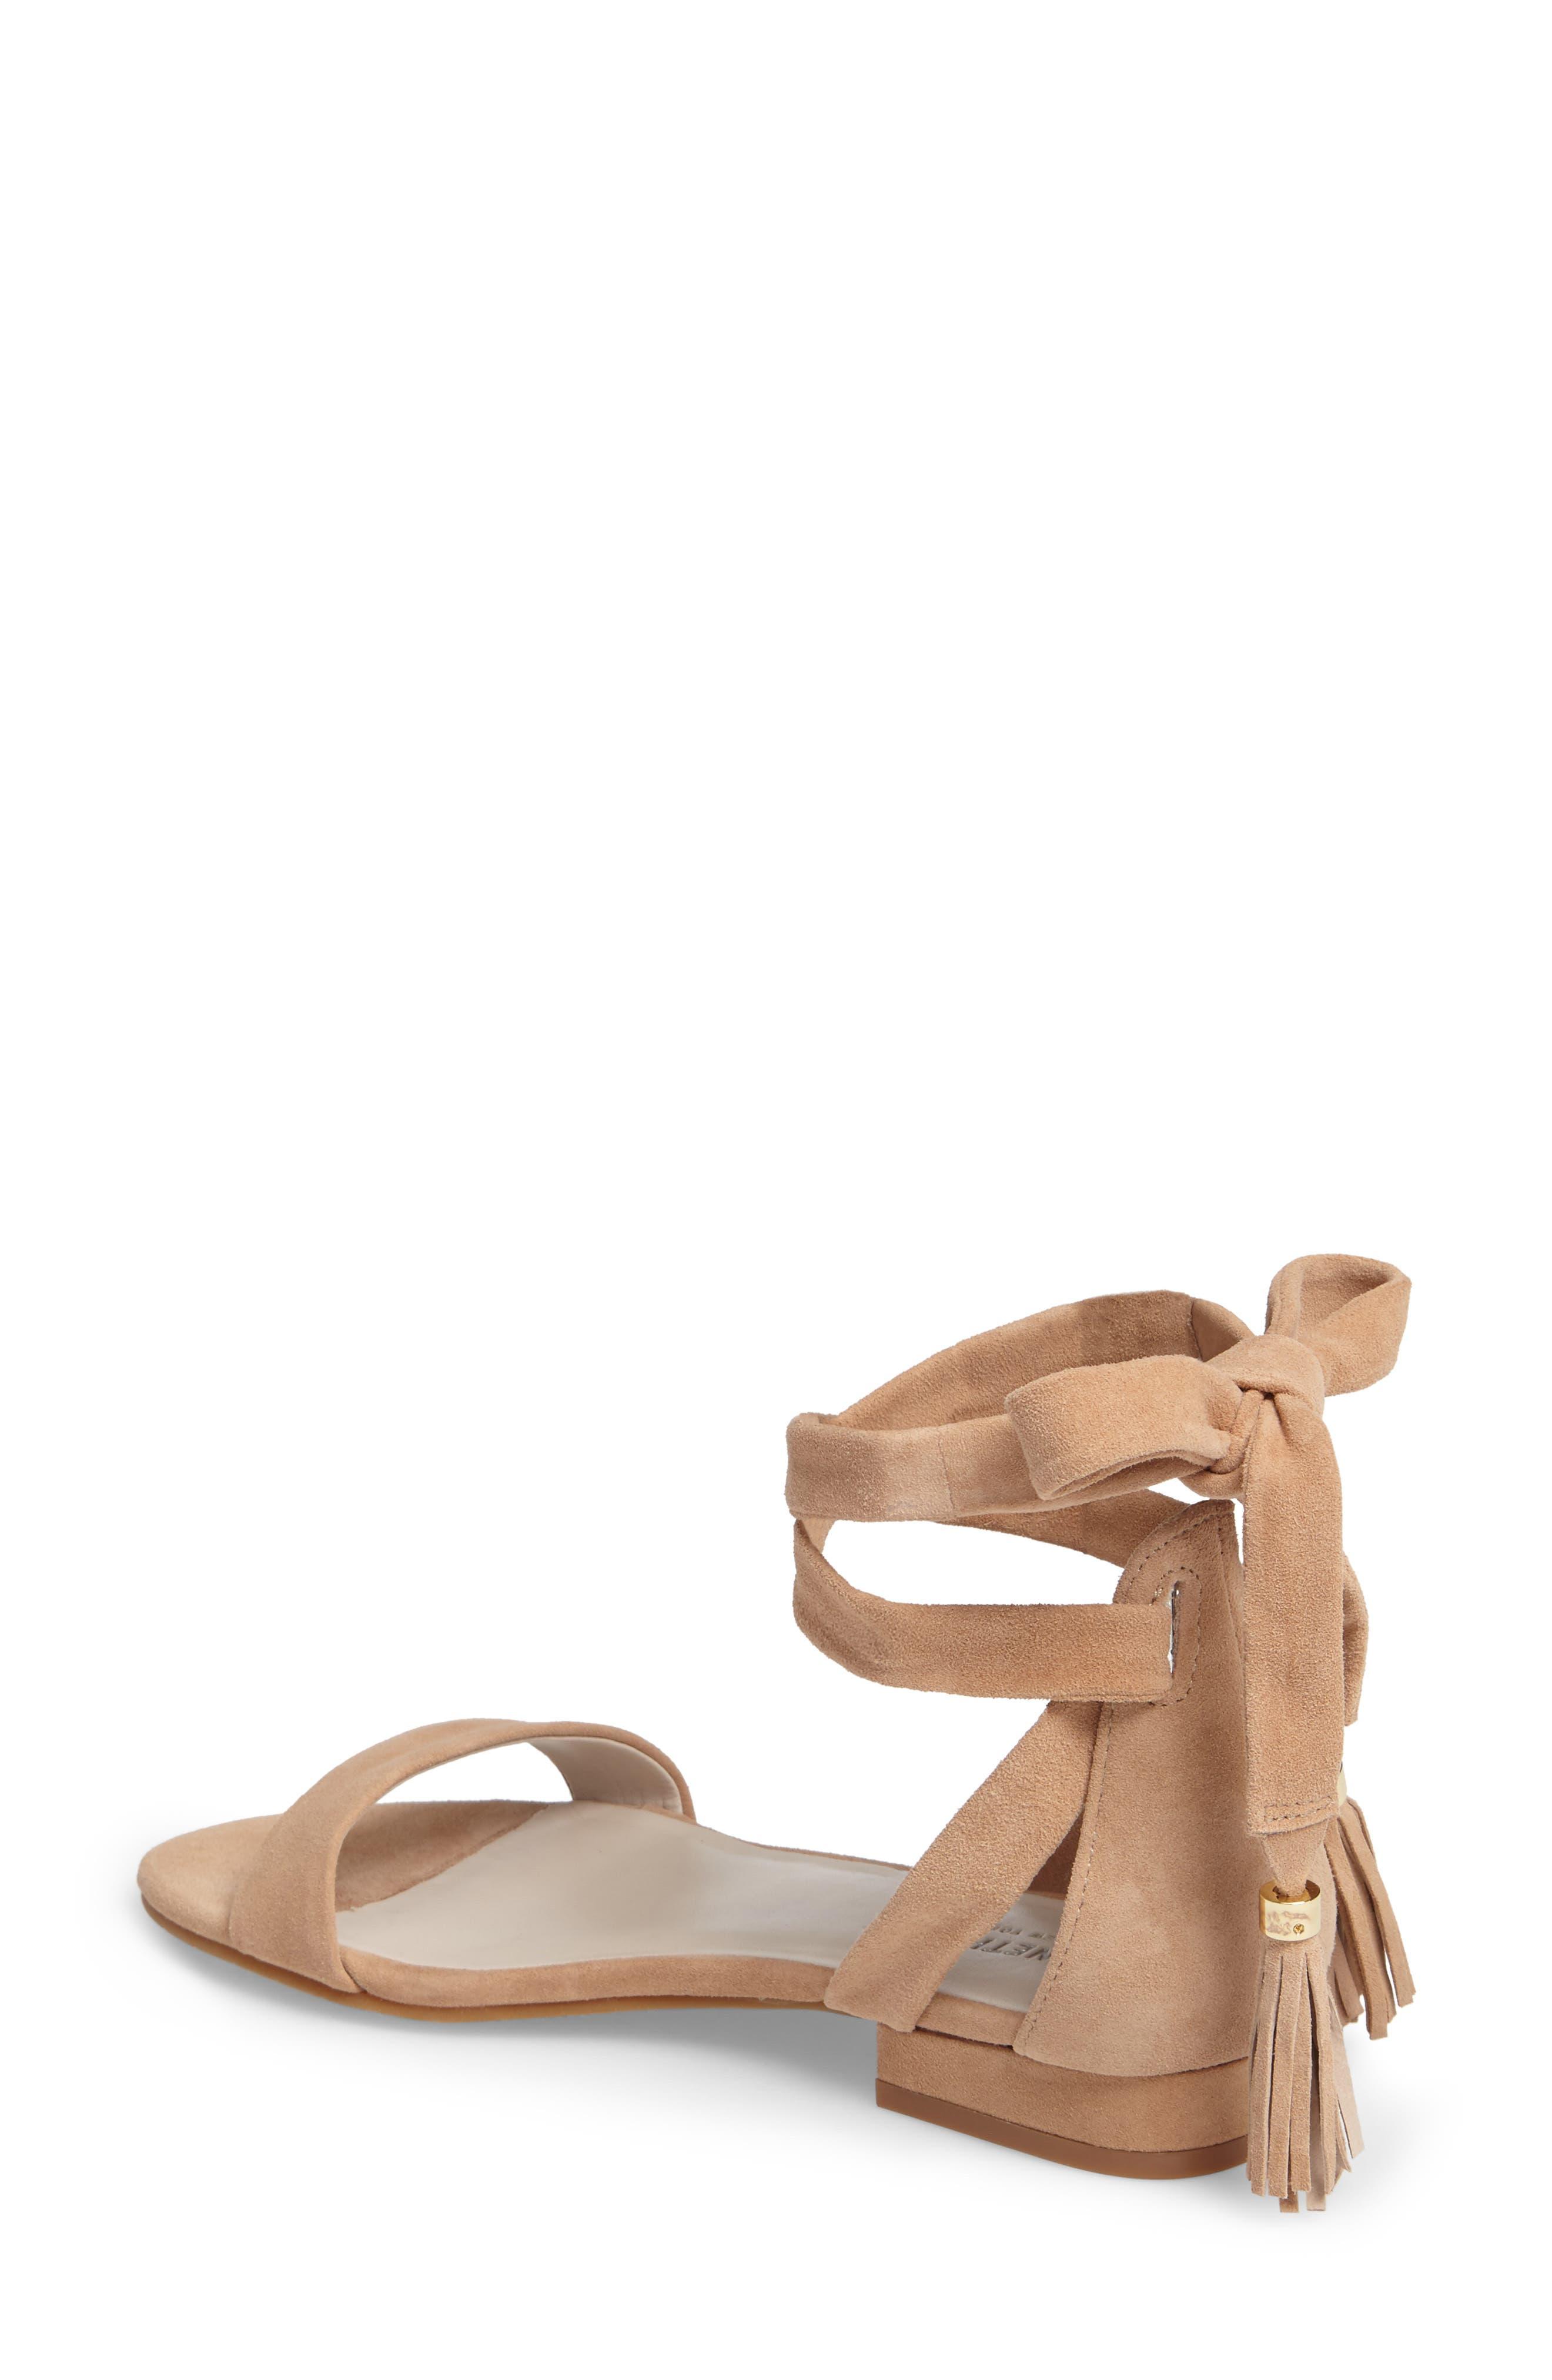 Valen Tassel Lace-Up Sandal,                             Alternate thumbnail 20, color,